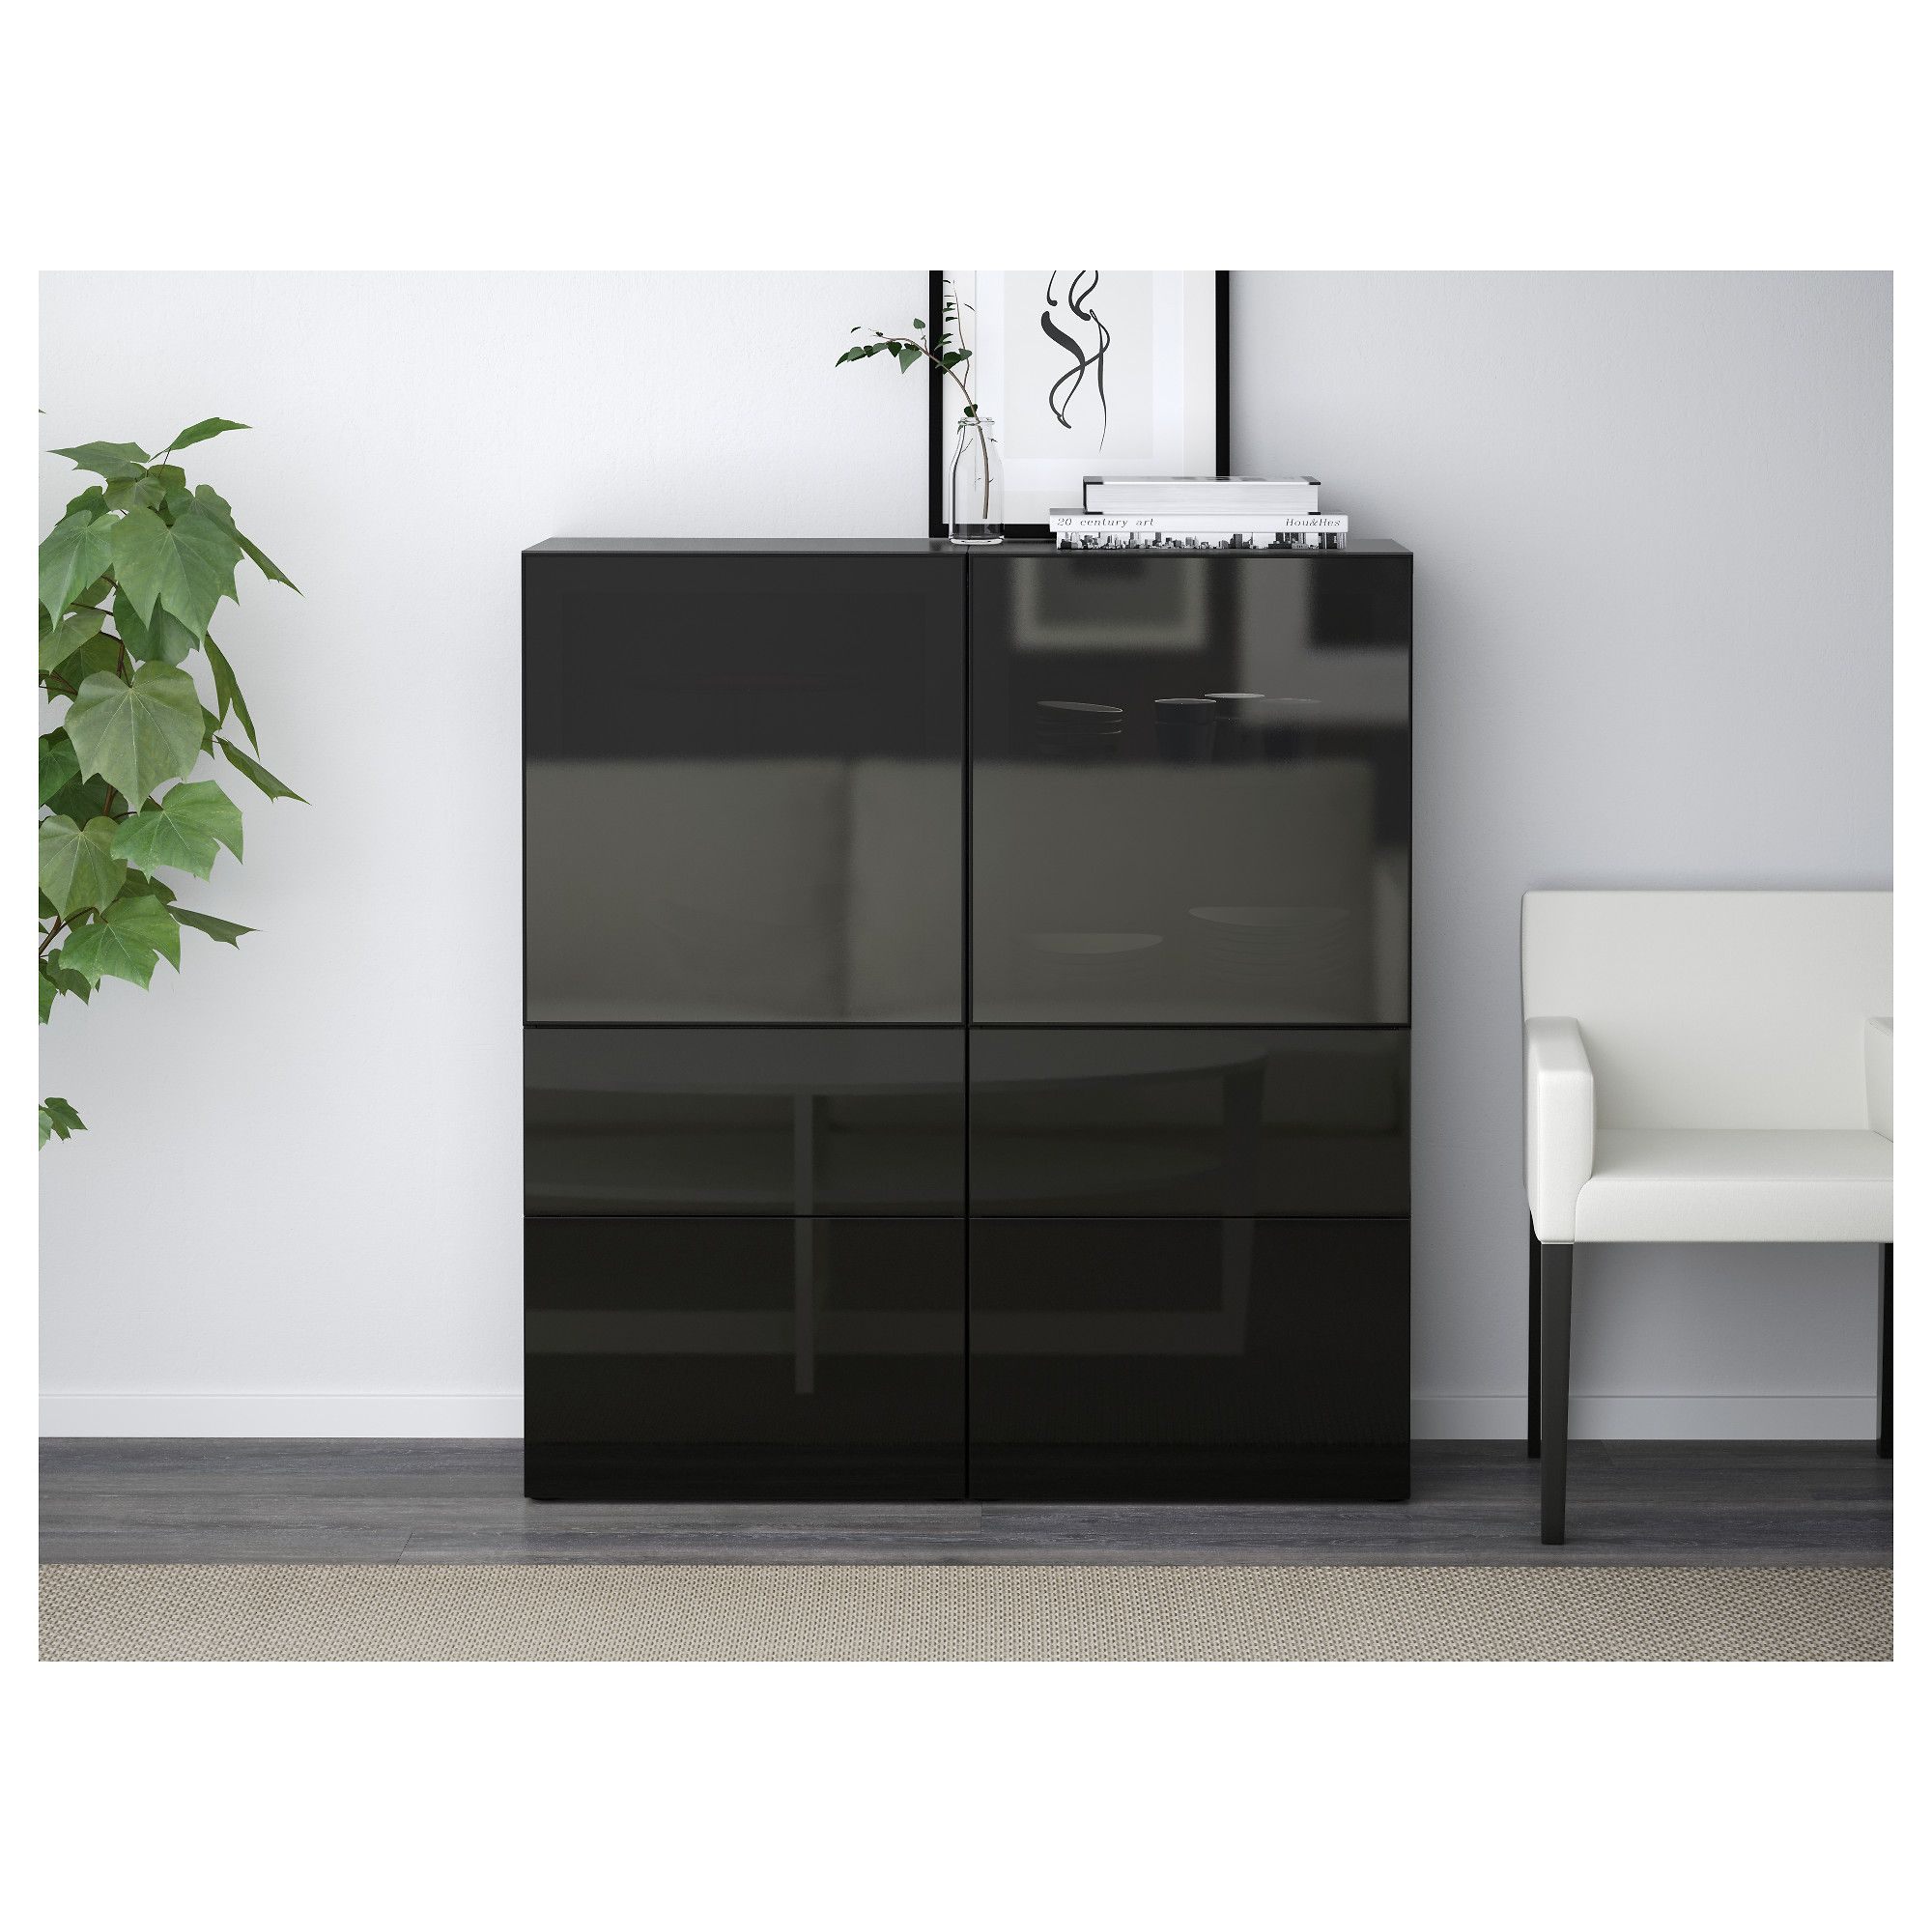 BESTÅ Storage combination w/glass doors blackbrown